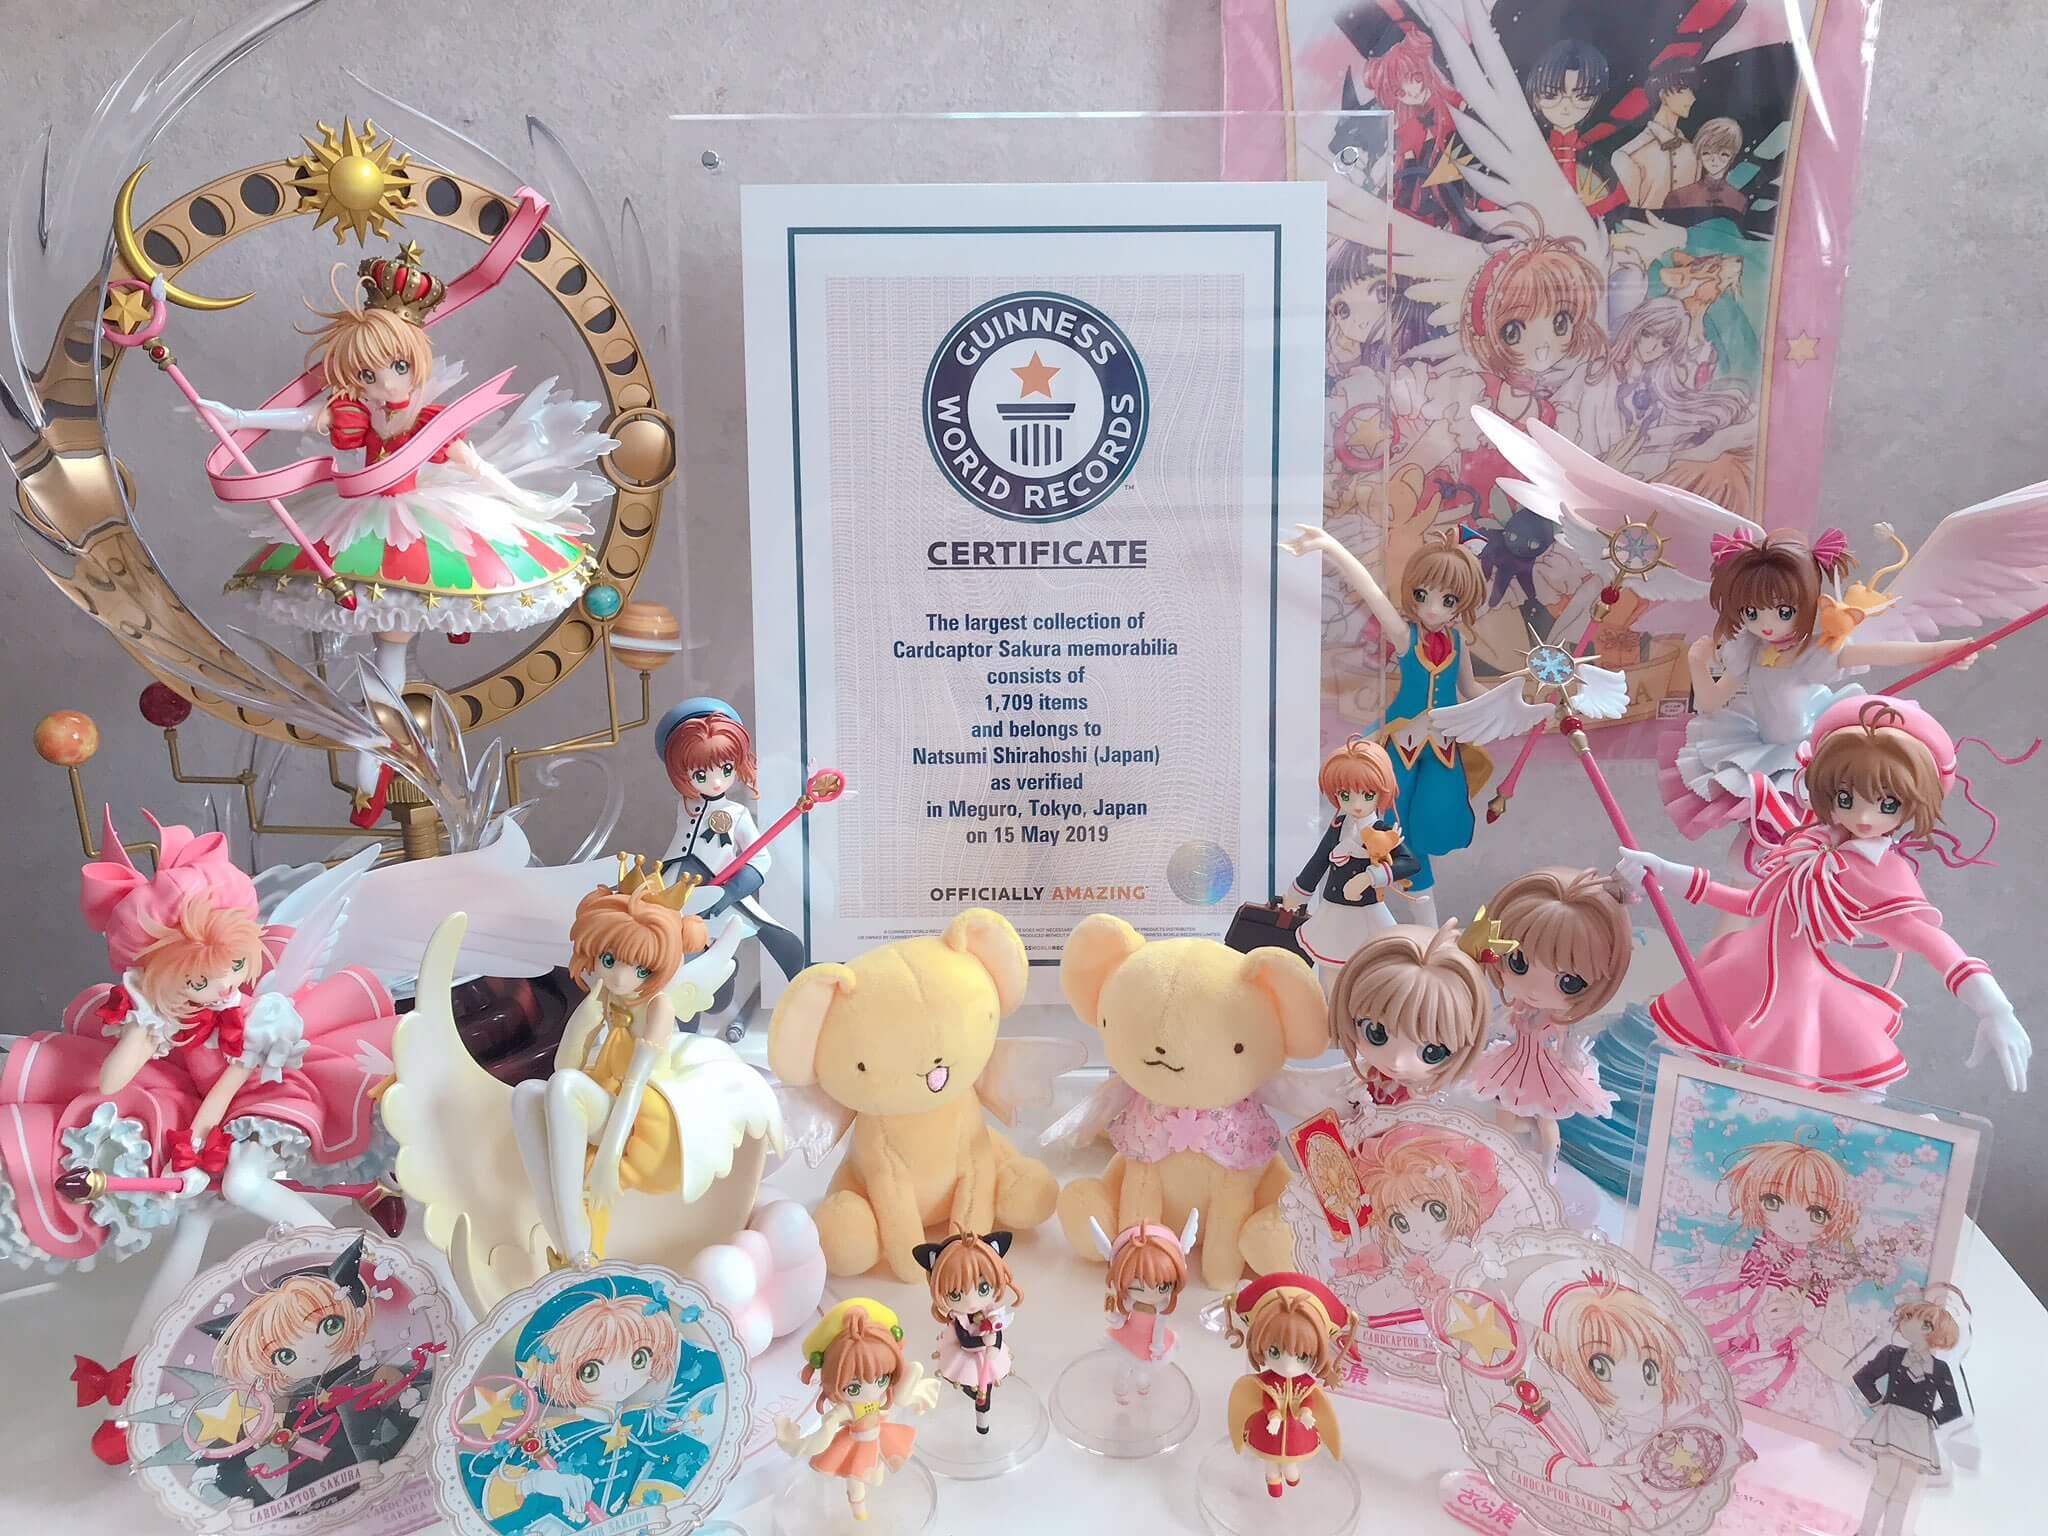 Sakura Card Captors - Guinness